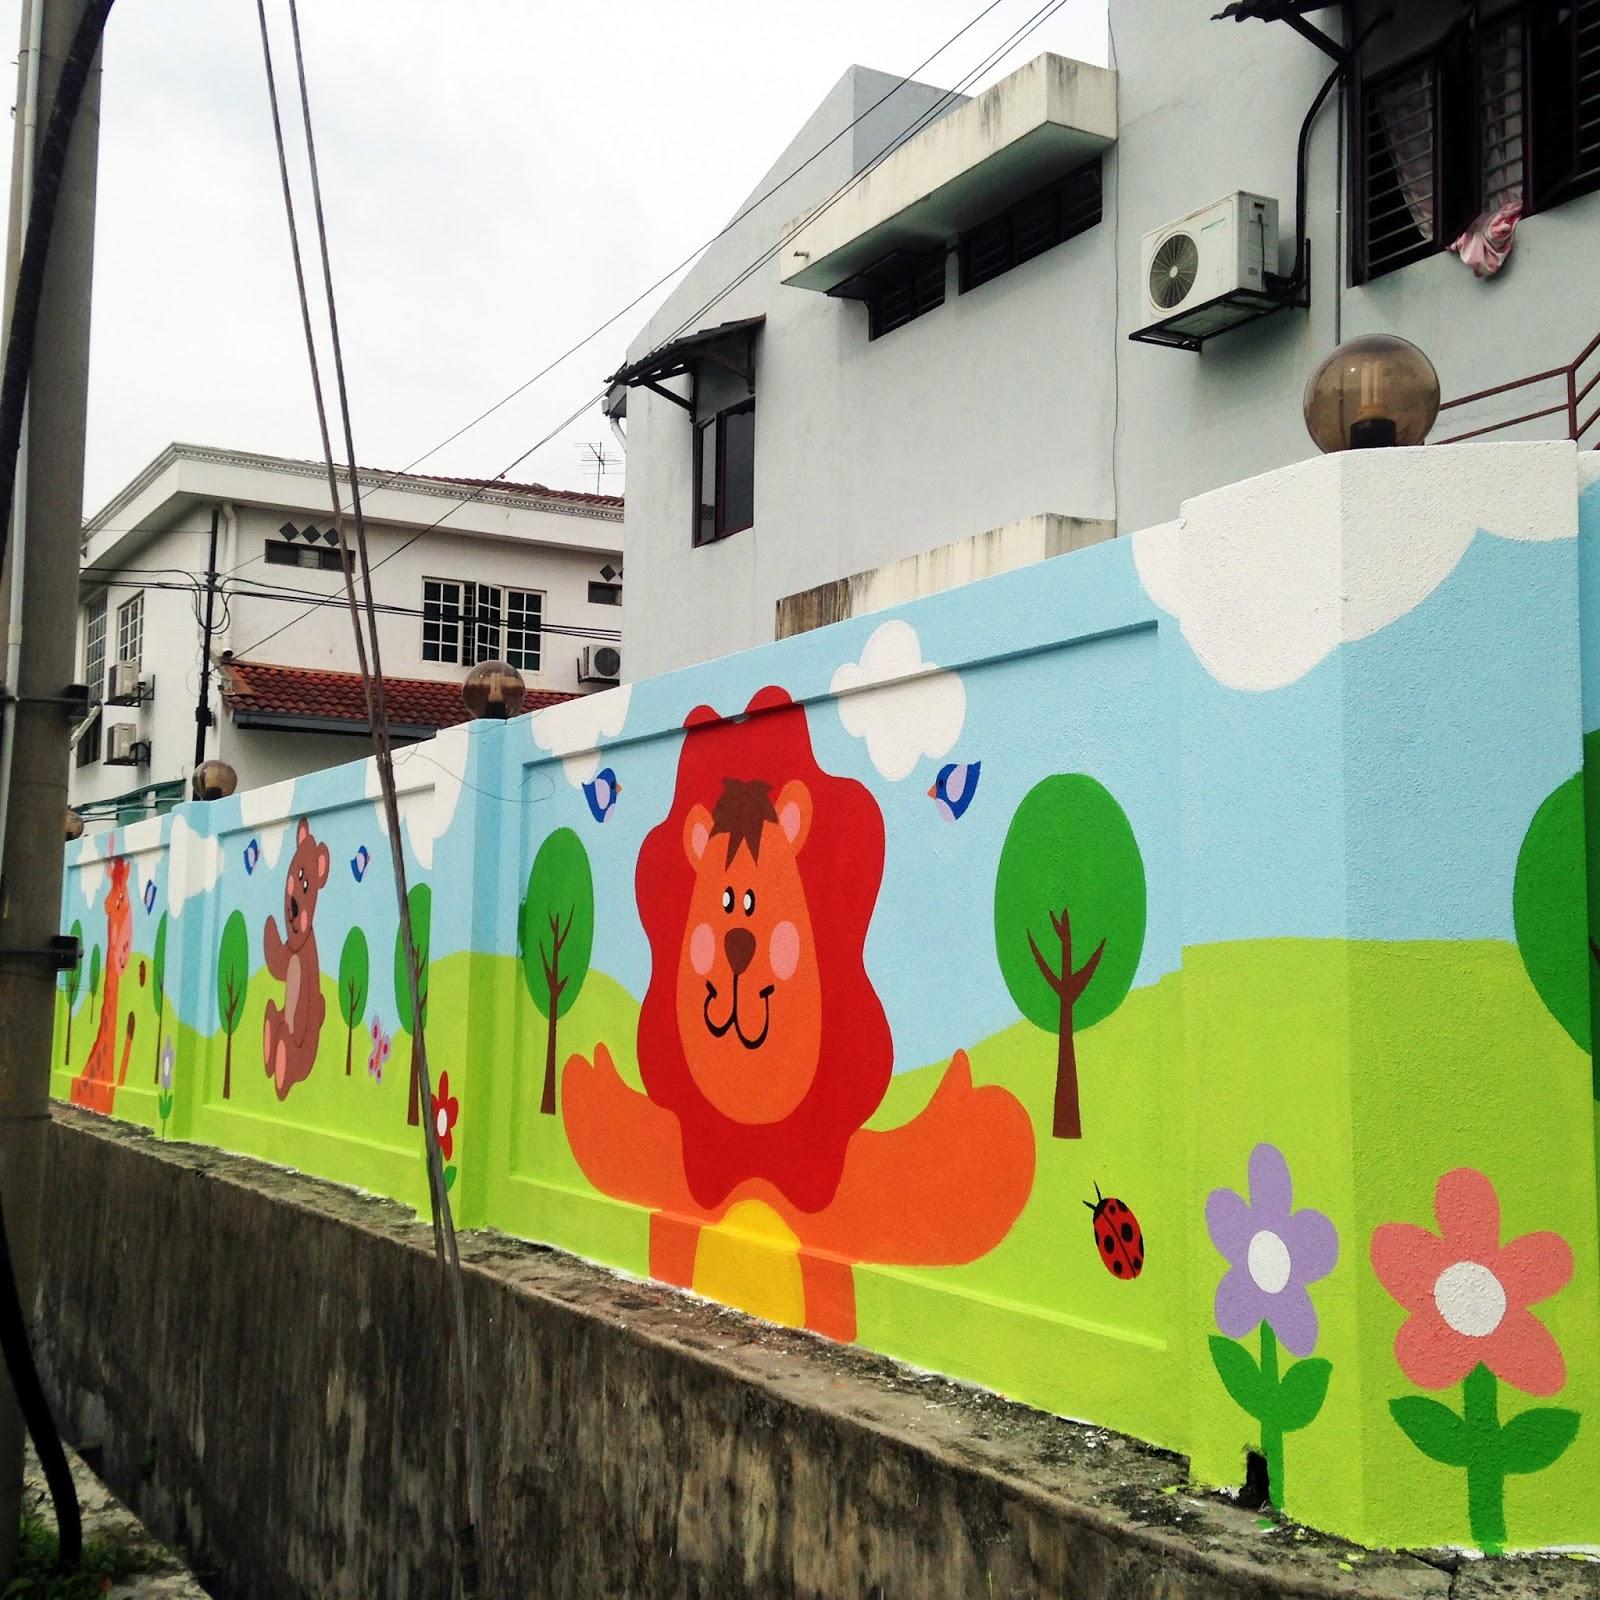 Warna arts mural playful child like cute animals for Mural tadika